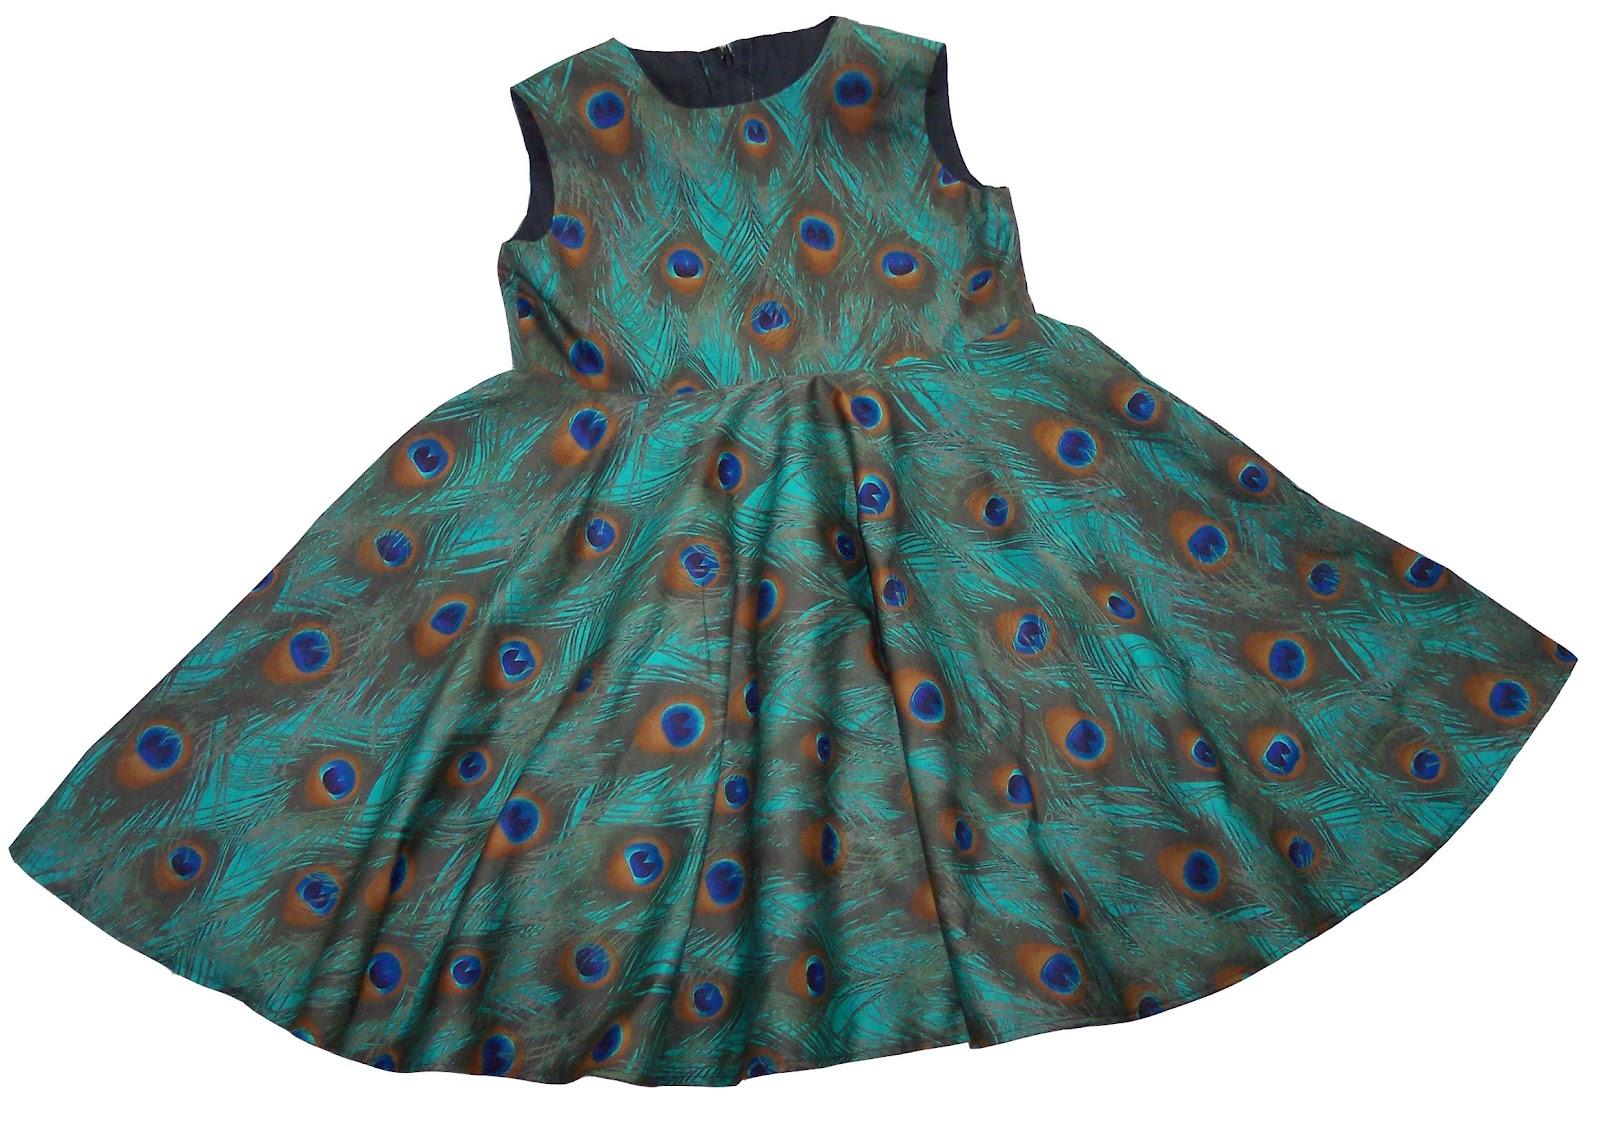 Alternatots Childrens Clothing